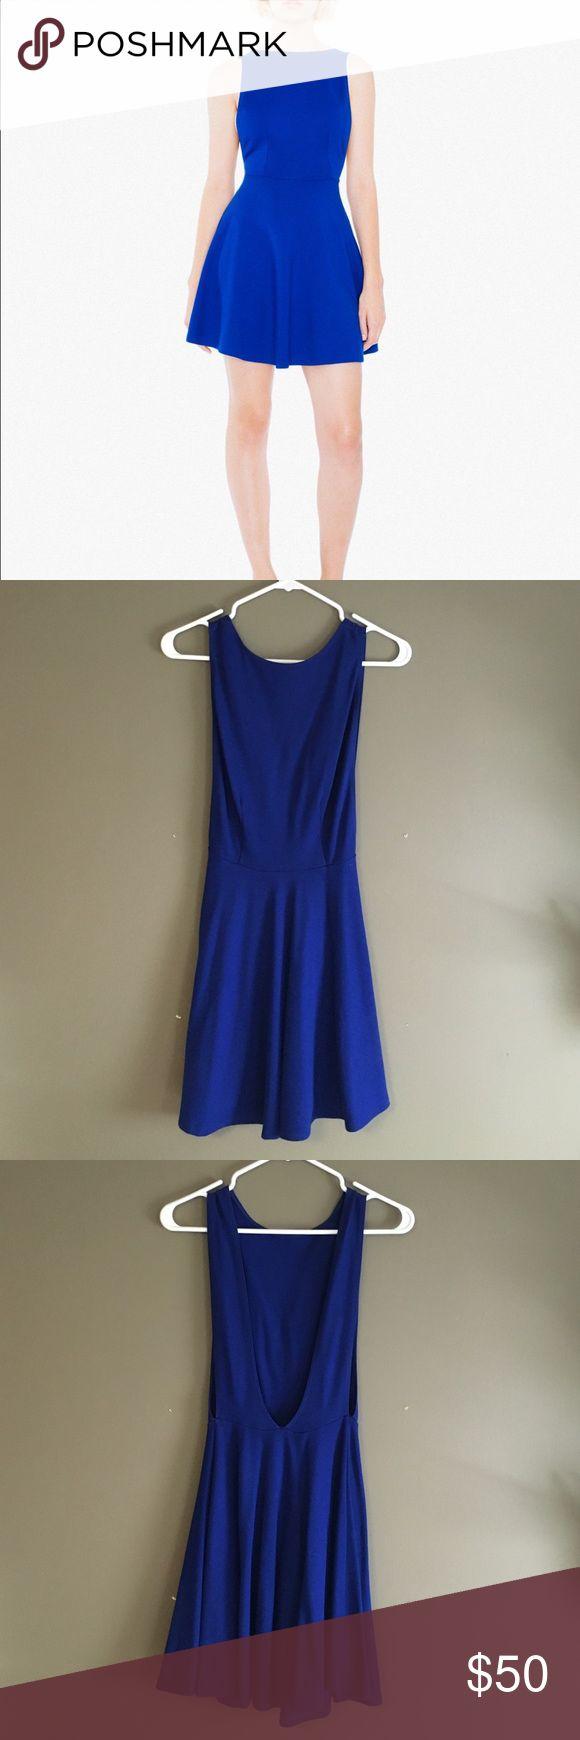 American apparel Ponte Sleeveless Skater Dress Only worn once, blue American apparel Ponte Sleeveless Skater Dress. Great condition American Apparel Dresses